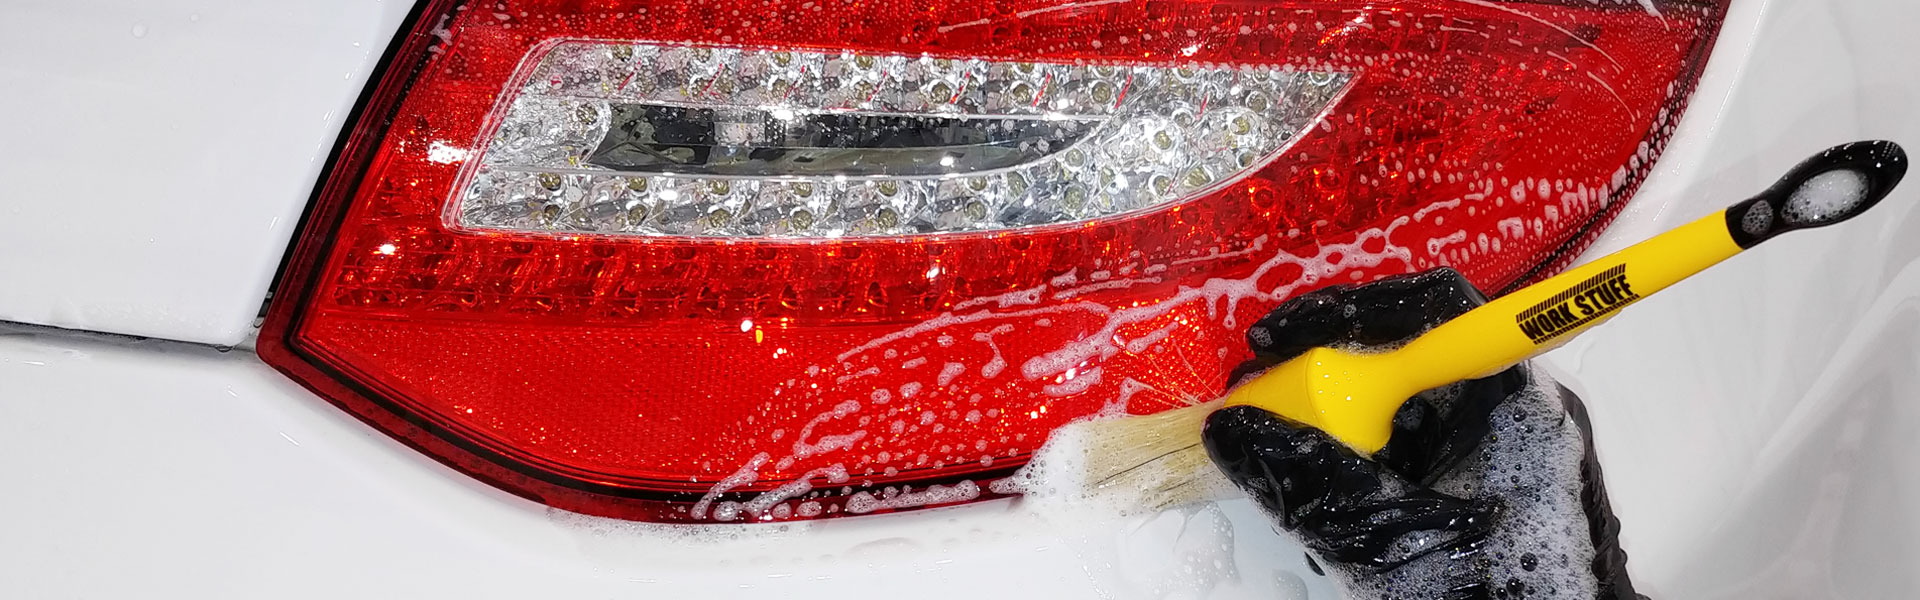 Mycie detalingowe, kompleksowy auto detailing